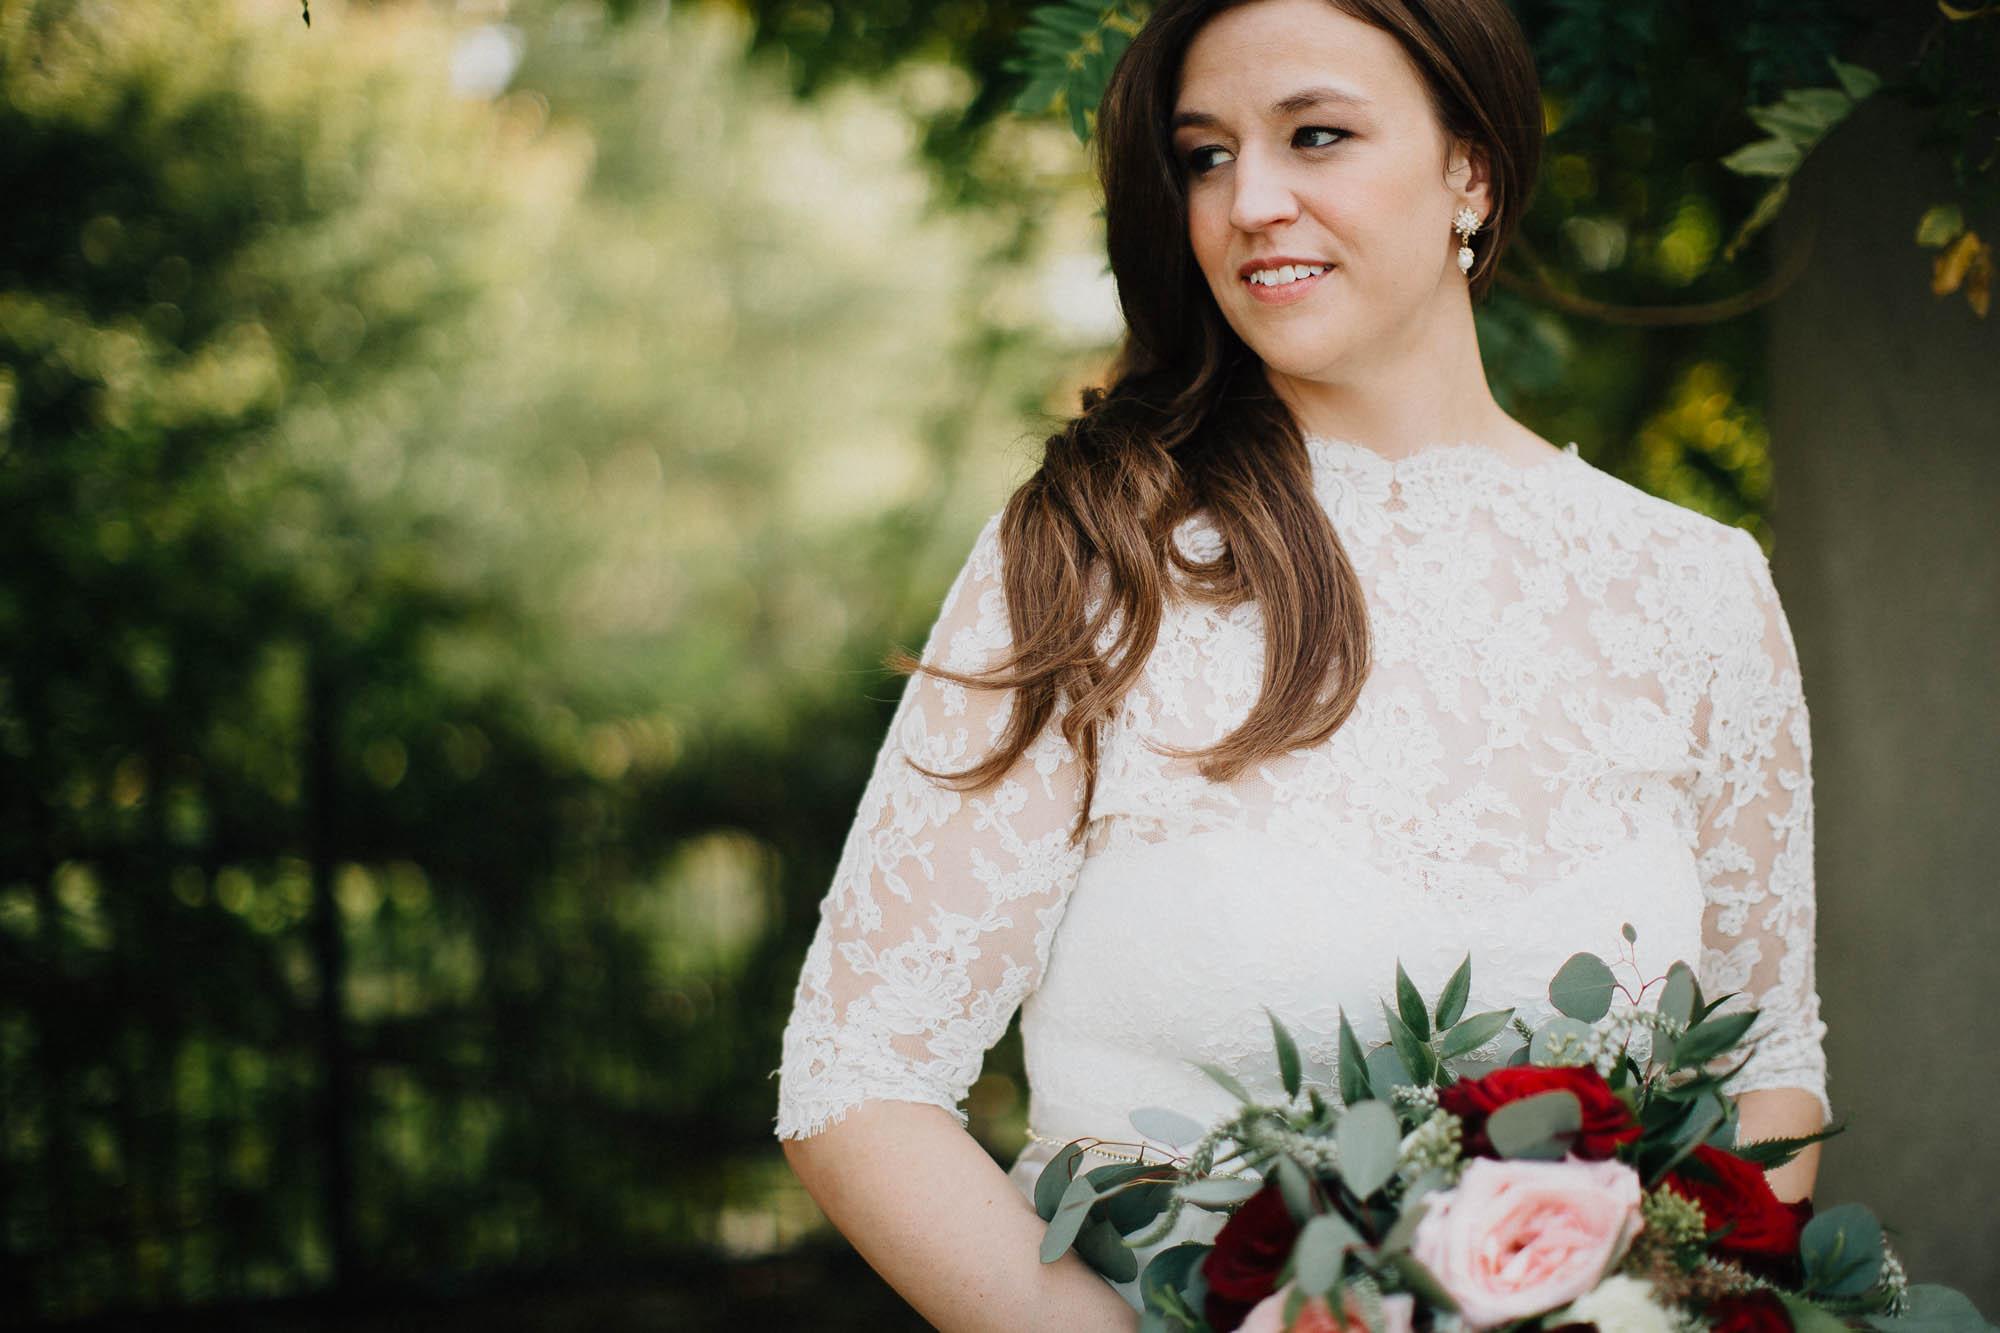 Highline-Car-House-Wedding-Columbus-Kristin-Aaron-048.jpg